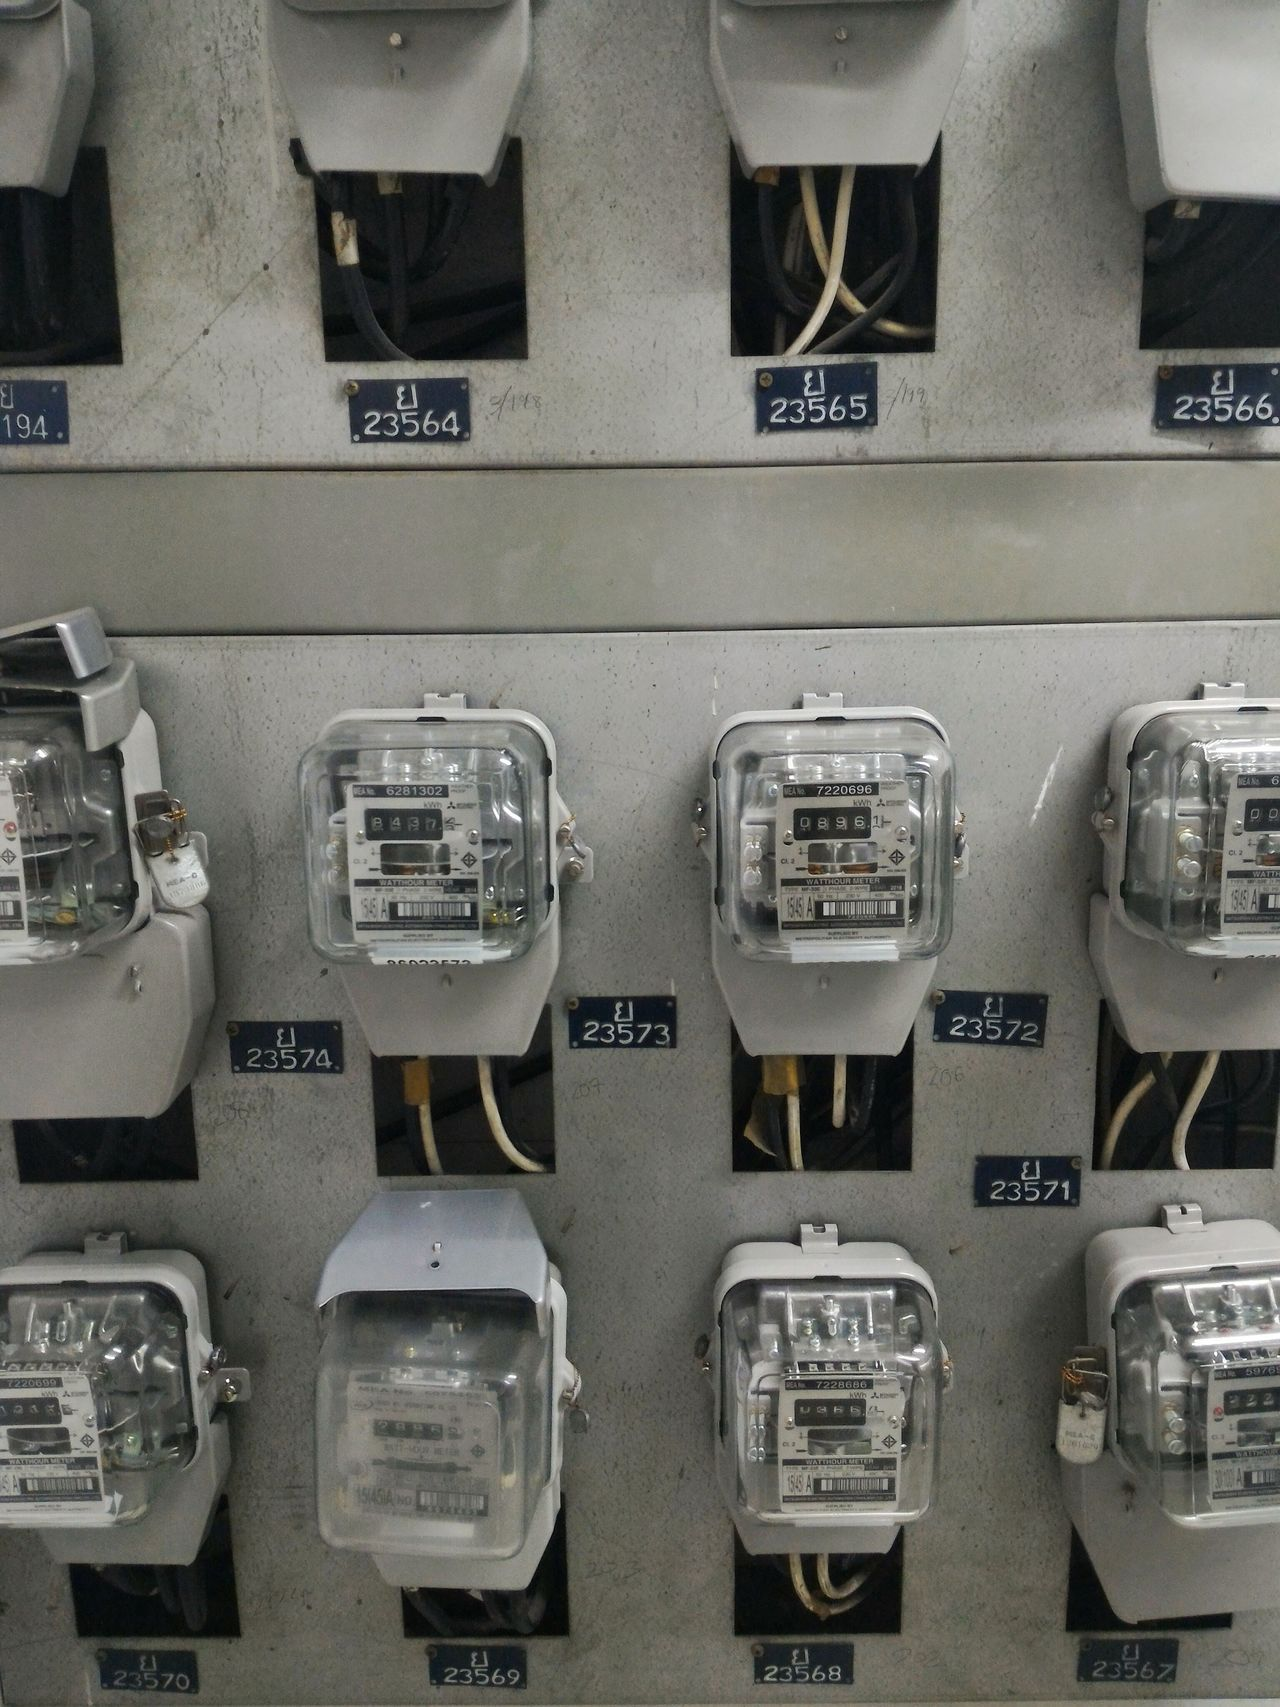 Electrical Equipment Electric Meters Meter - Instrument Of Measurement No People Indoors  City Condo